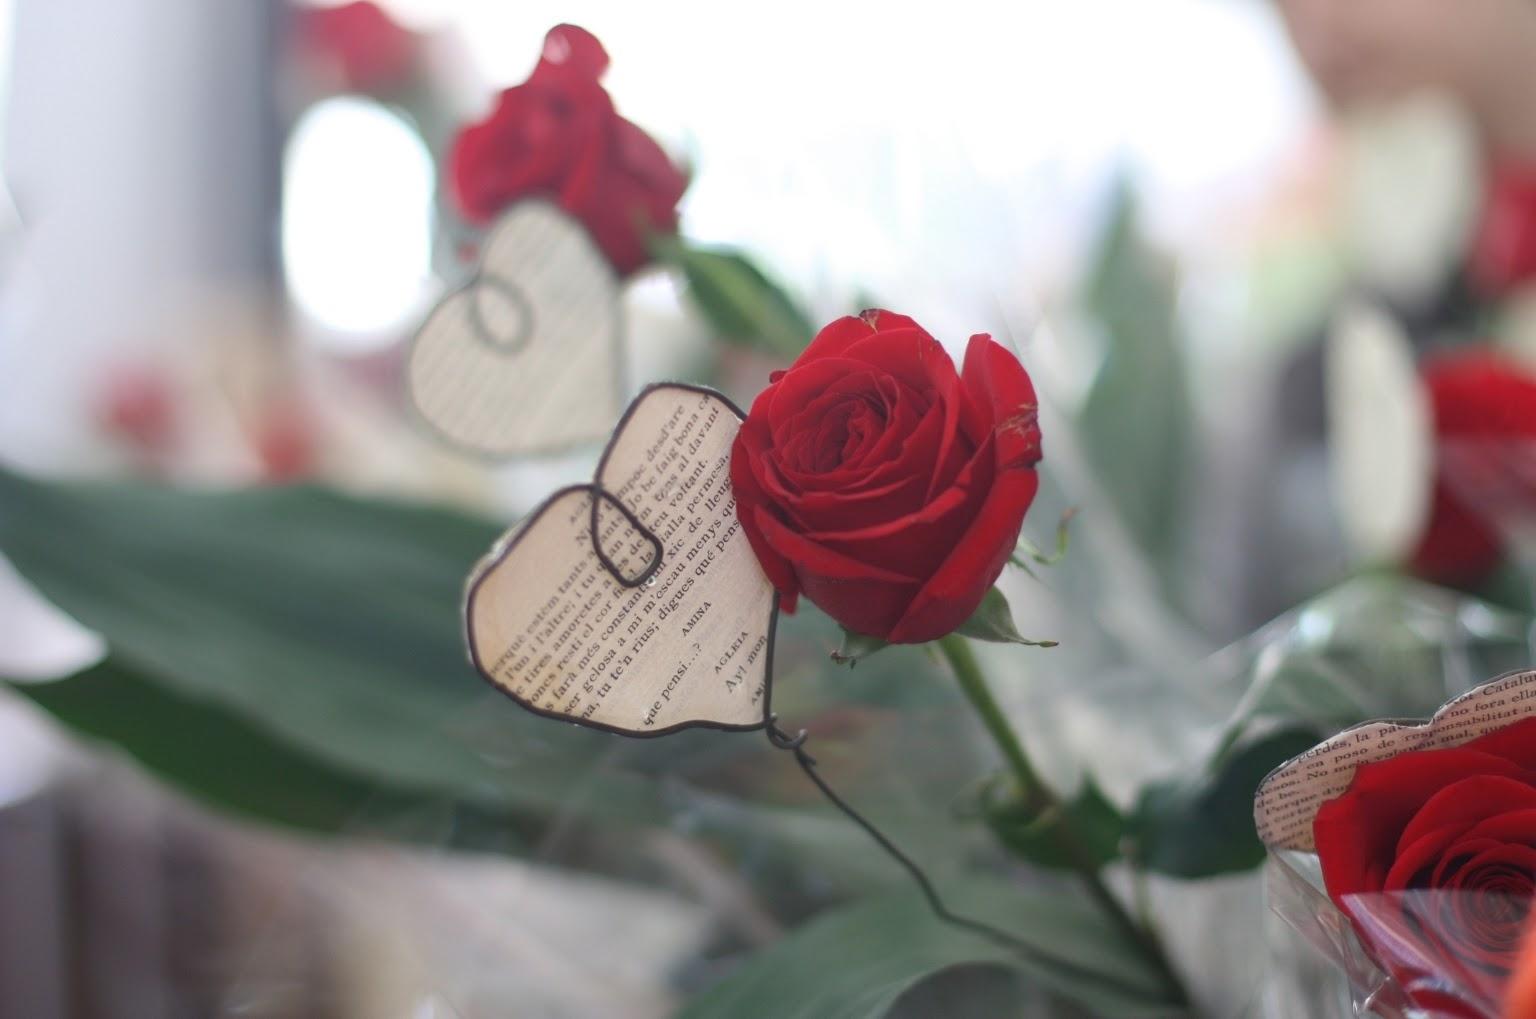 Día de Sant Jordi is Barcelona's Valentine's Day